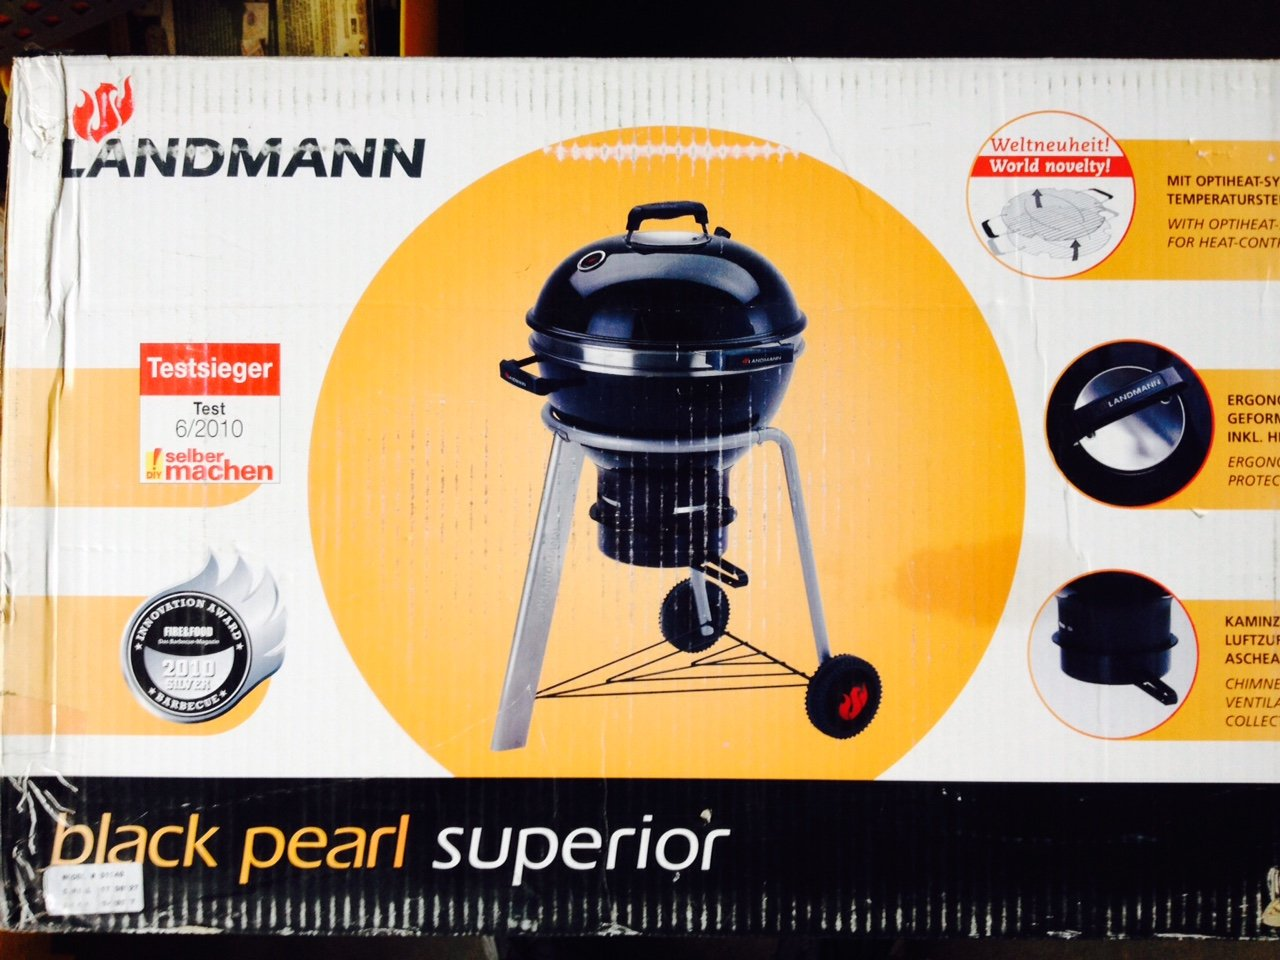 Landmann Kugelgrill Black Pearl Superior bestellen